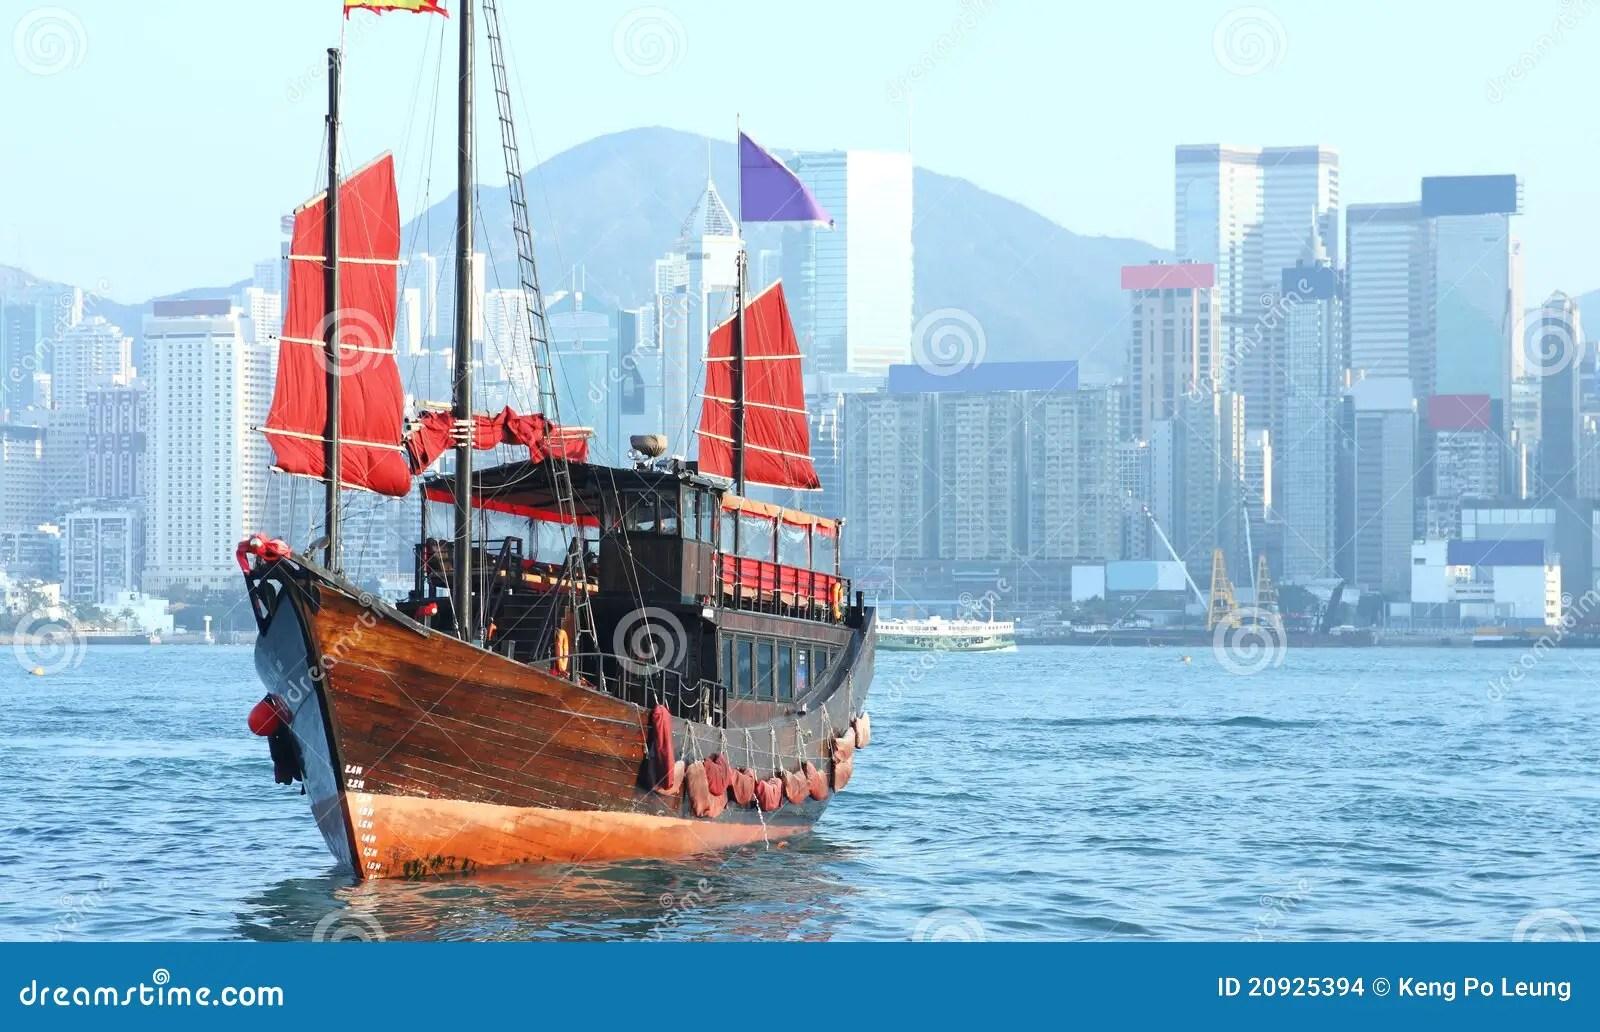 Hong Kong Junk Boat Stock Photo Image Of Modern Famous